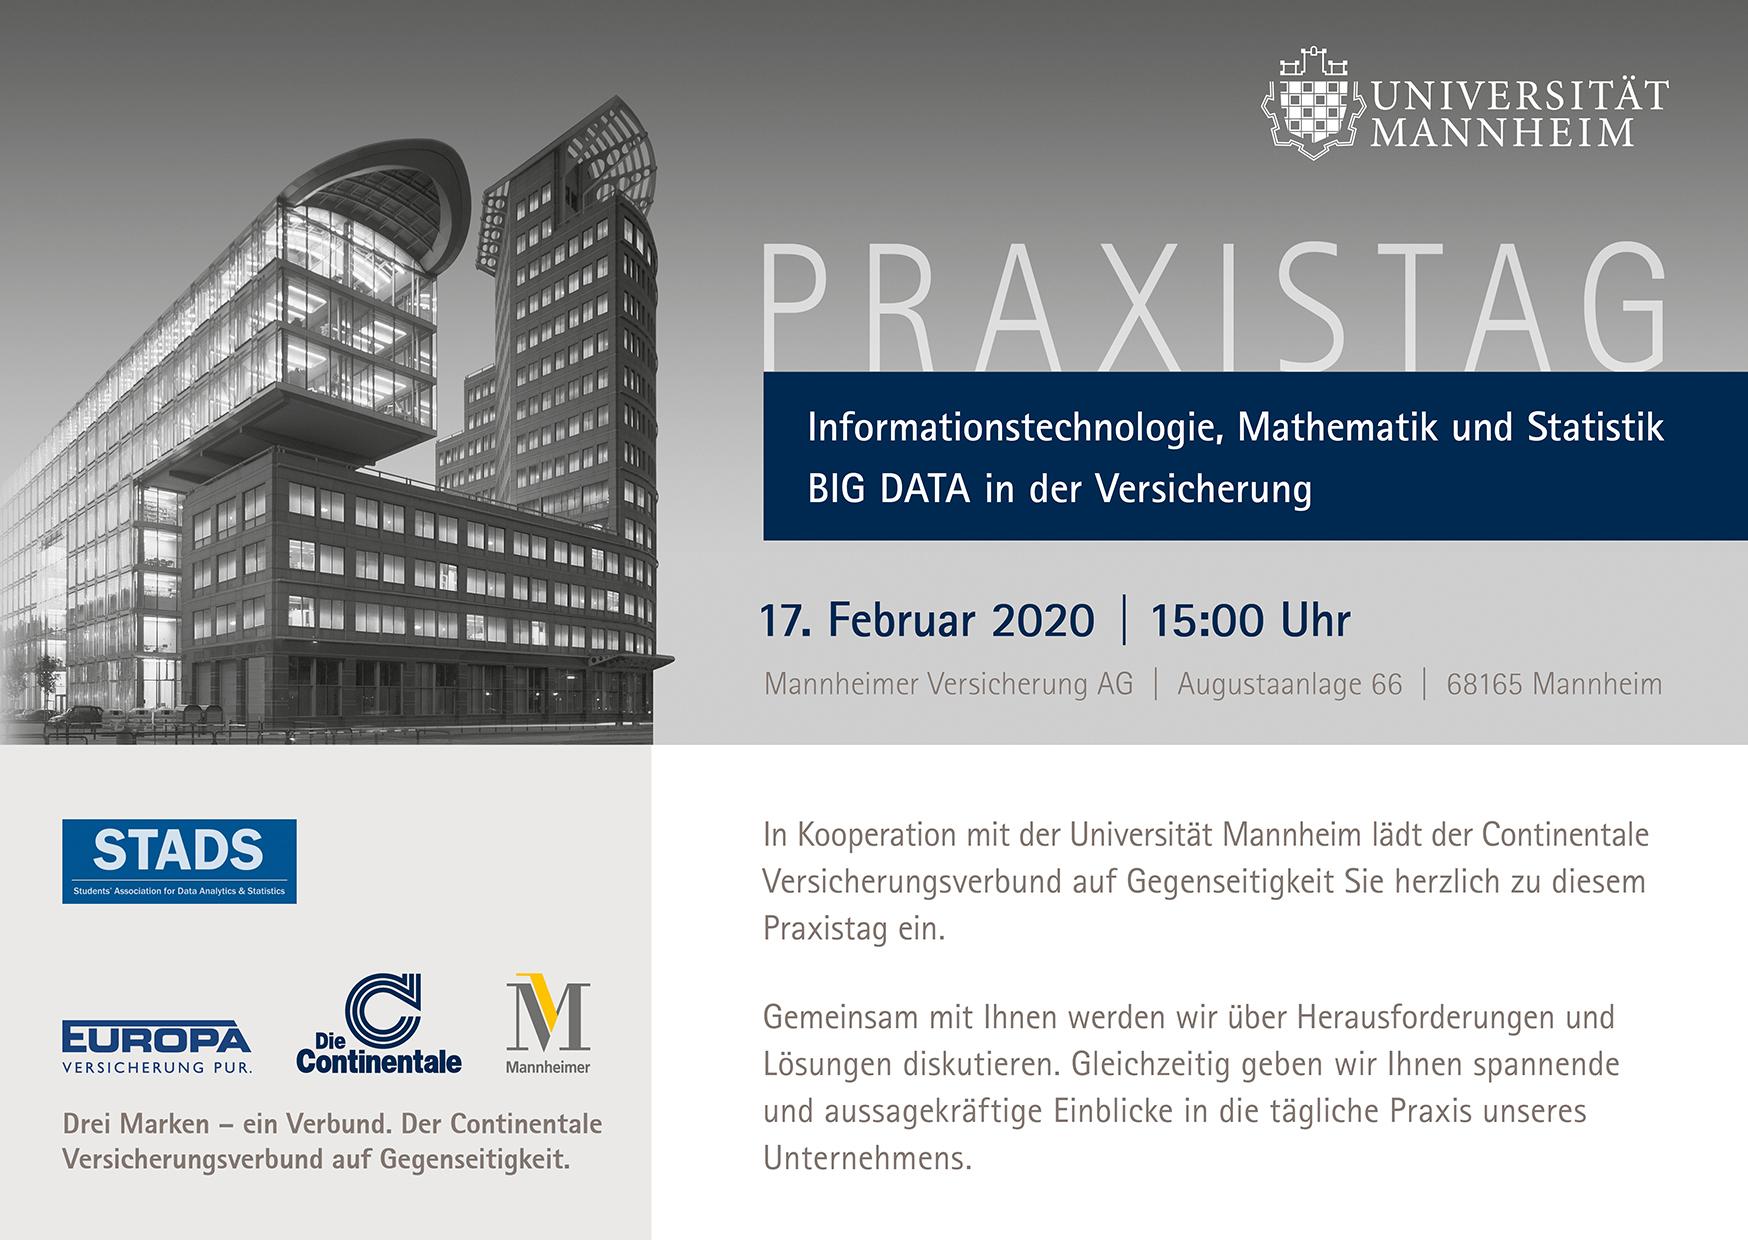 Praxistag Big Data bei der Mannheimer Versicherung